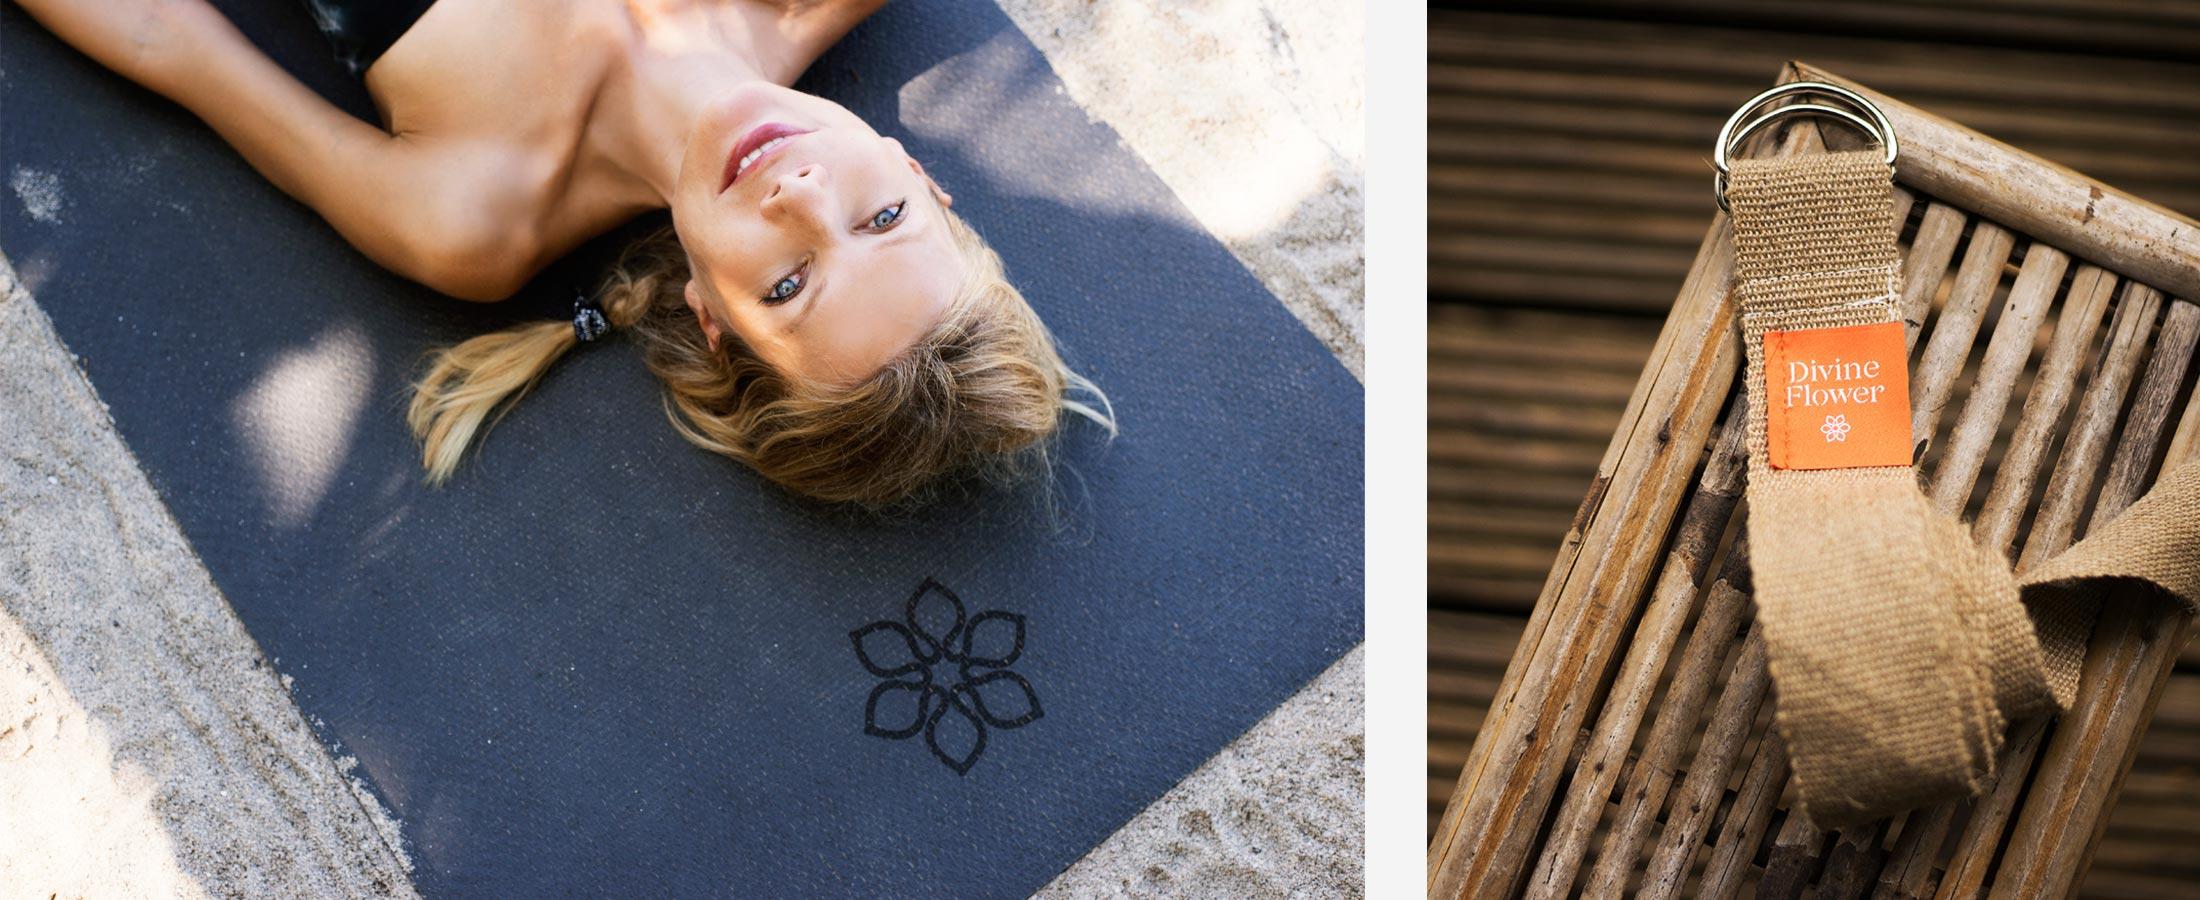 Divine Flower Yoga